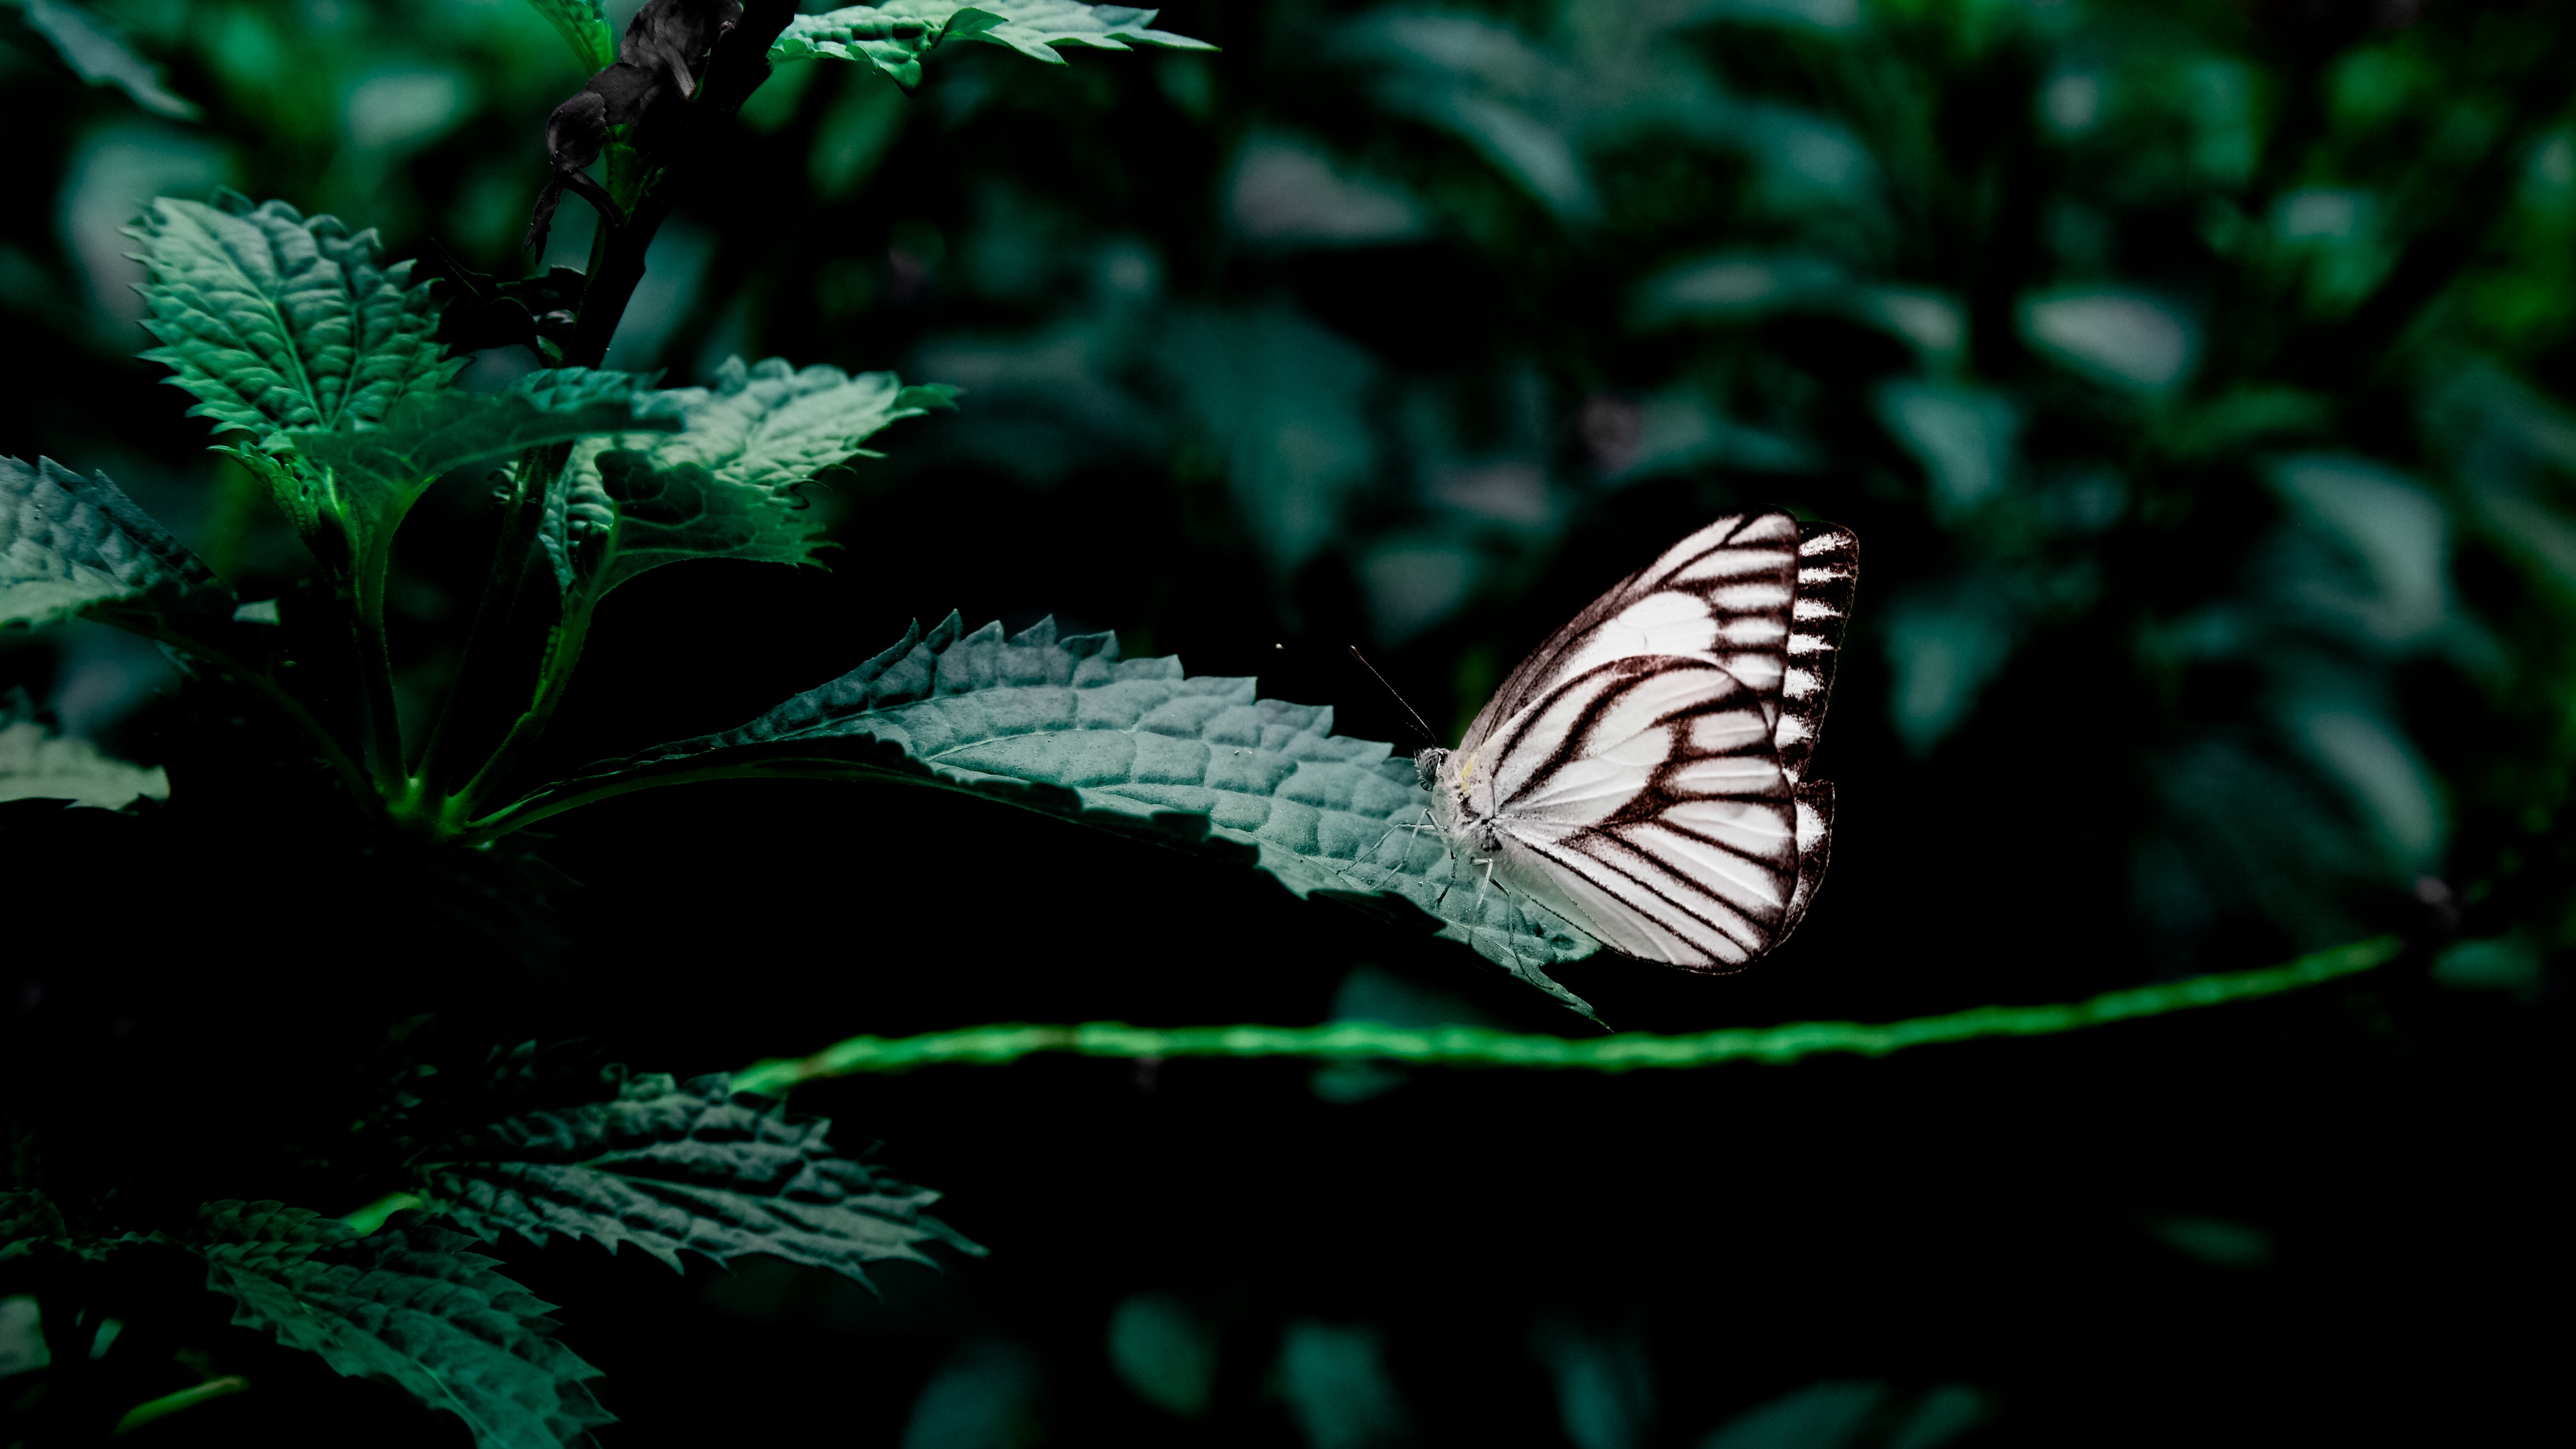 butterfly leaves insect 4k 1542242038 - butterfly, leaves, insect 4k - Leaves, insect, Butterfly